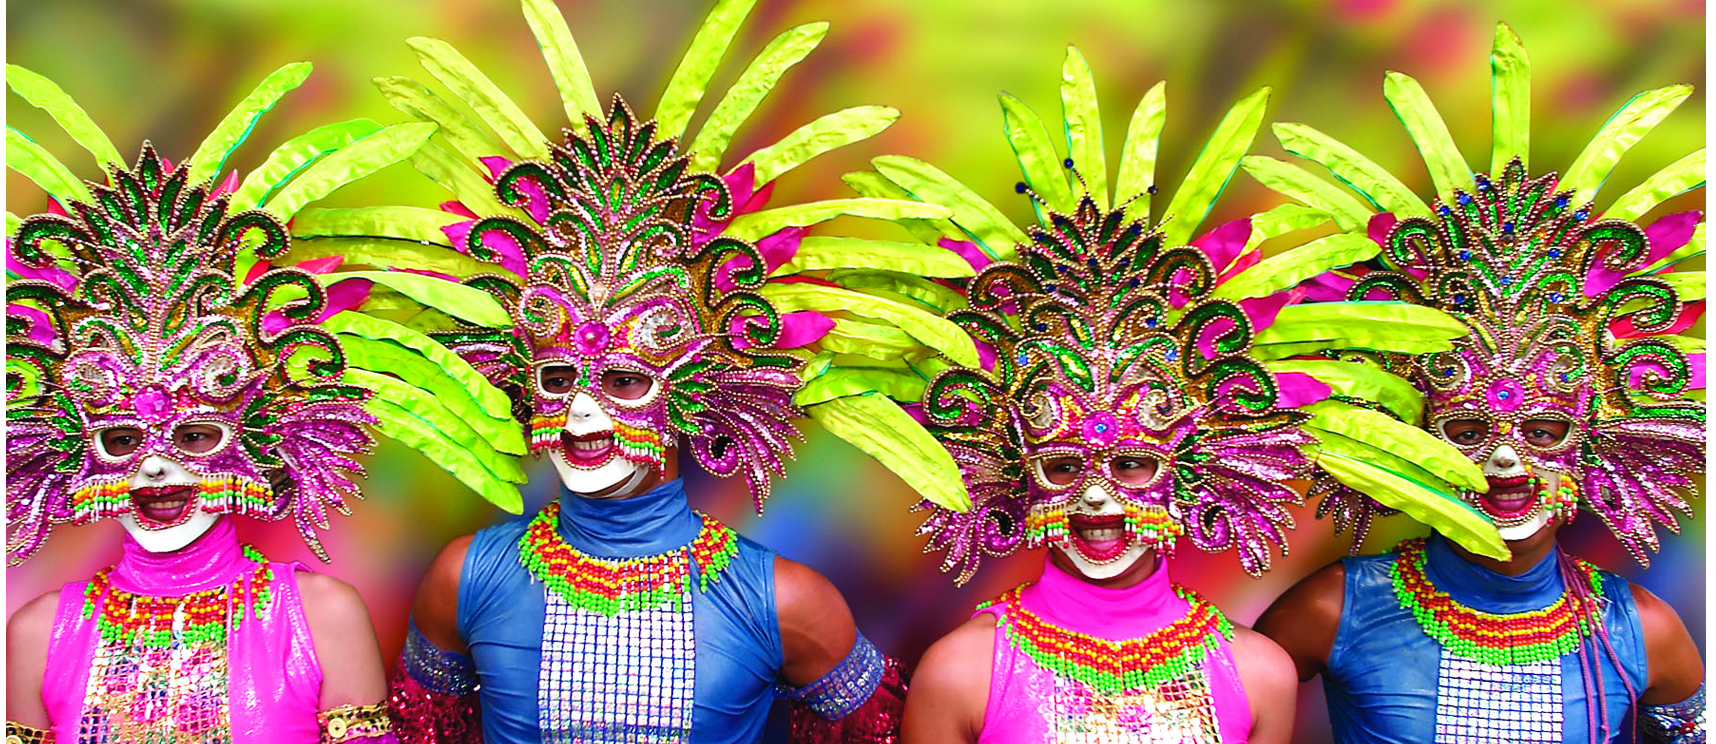 The MassKara Festival of Bacolod